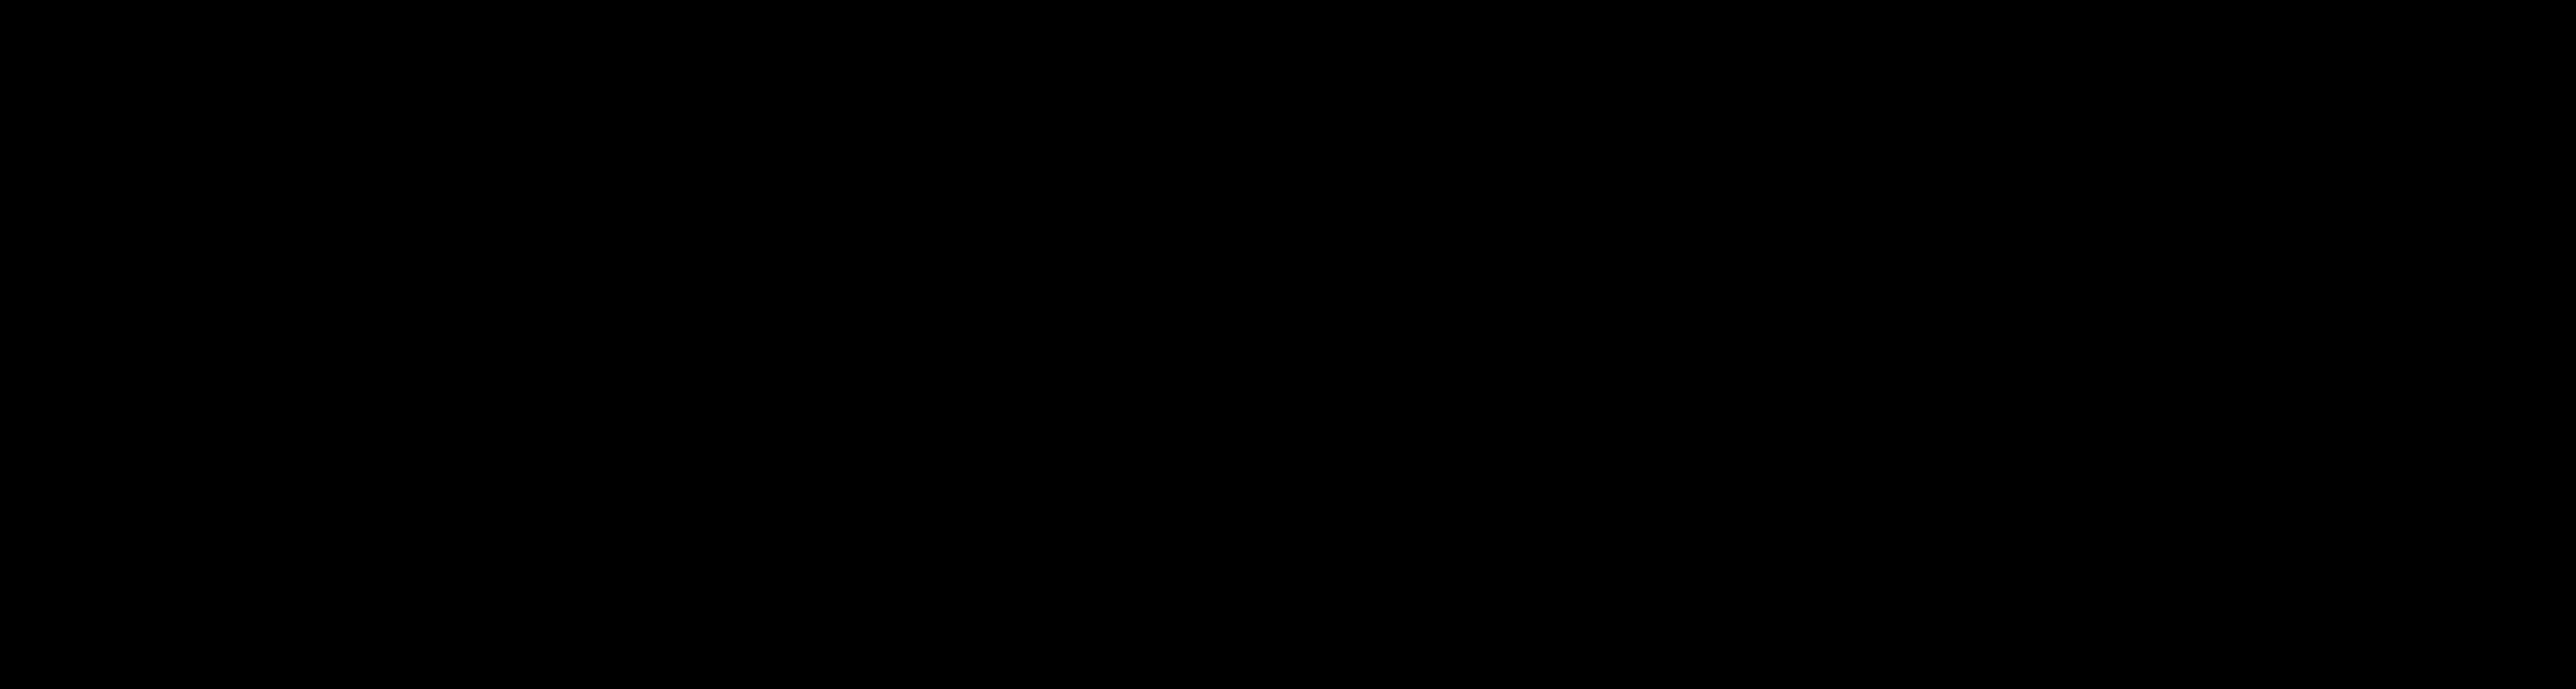 Logo ScentClub Australia - Perfume and Cologne subscription box